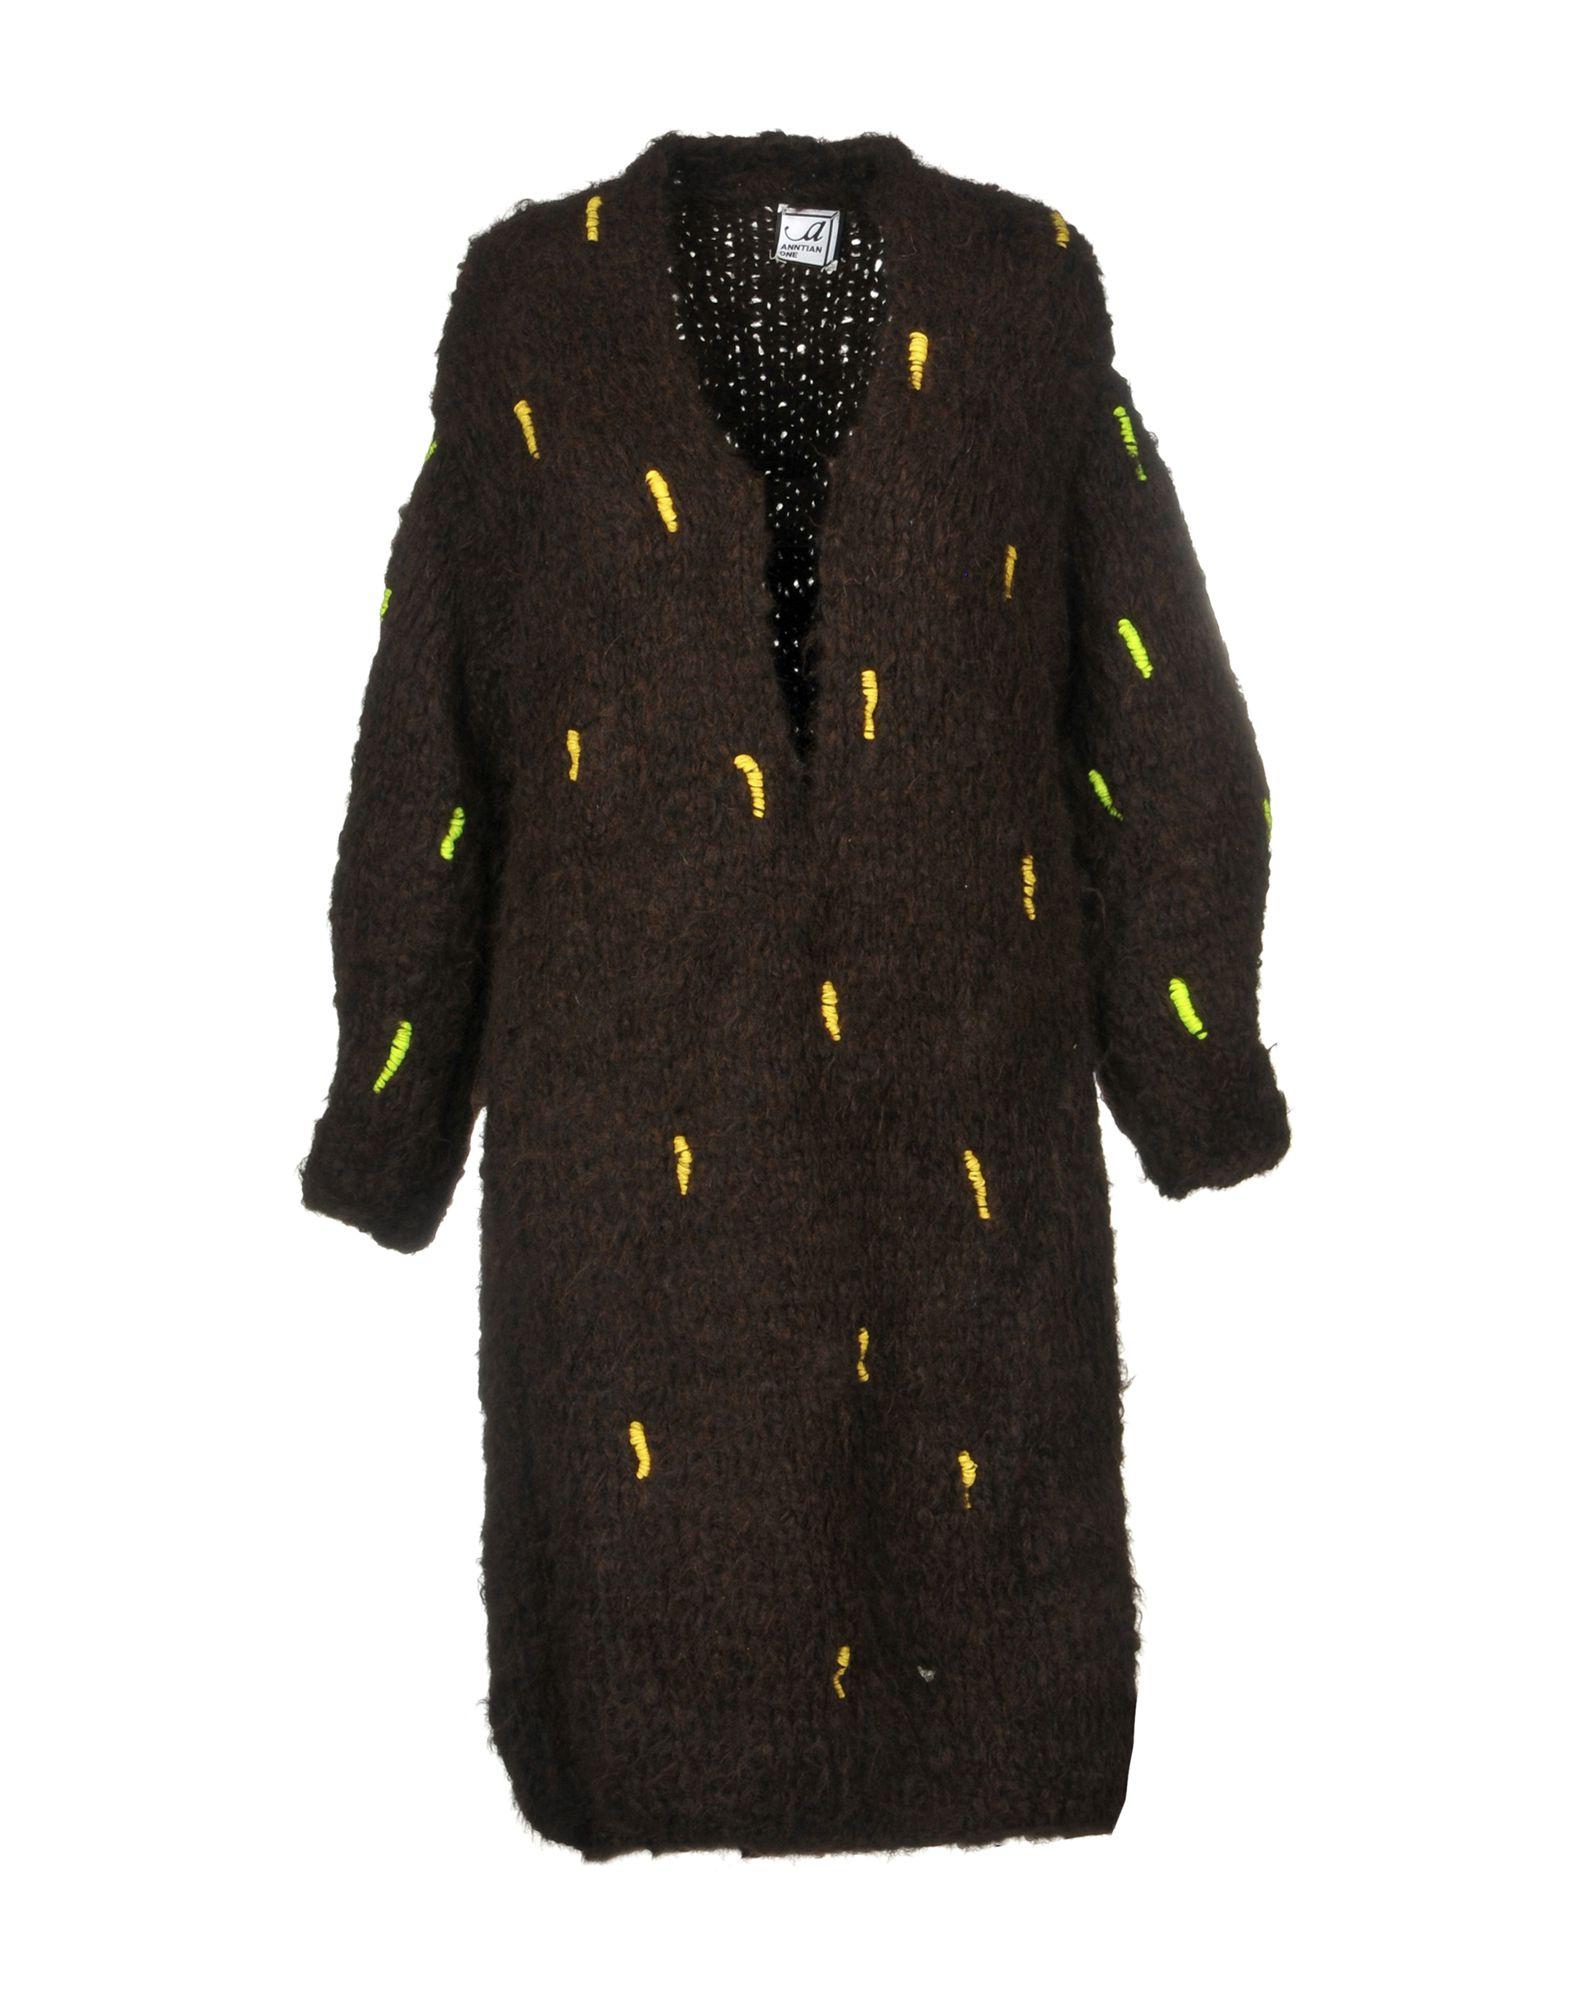 ANNTIAN Knee-Length Dress in Dark Brown